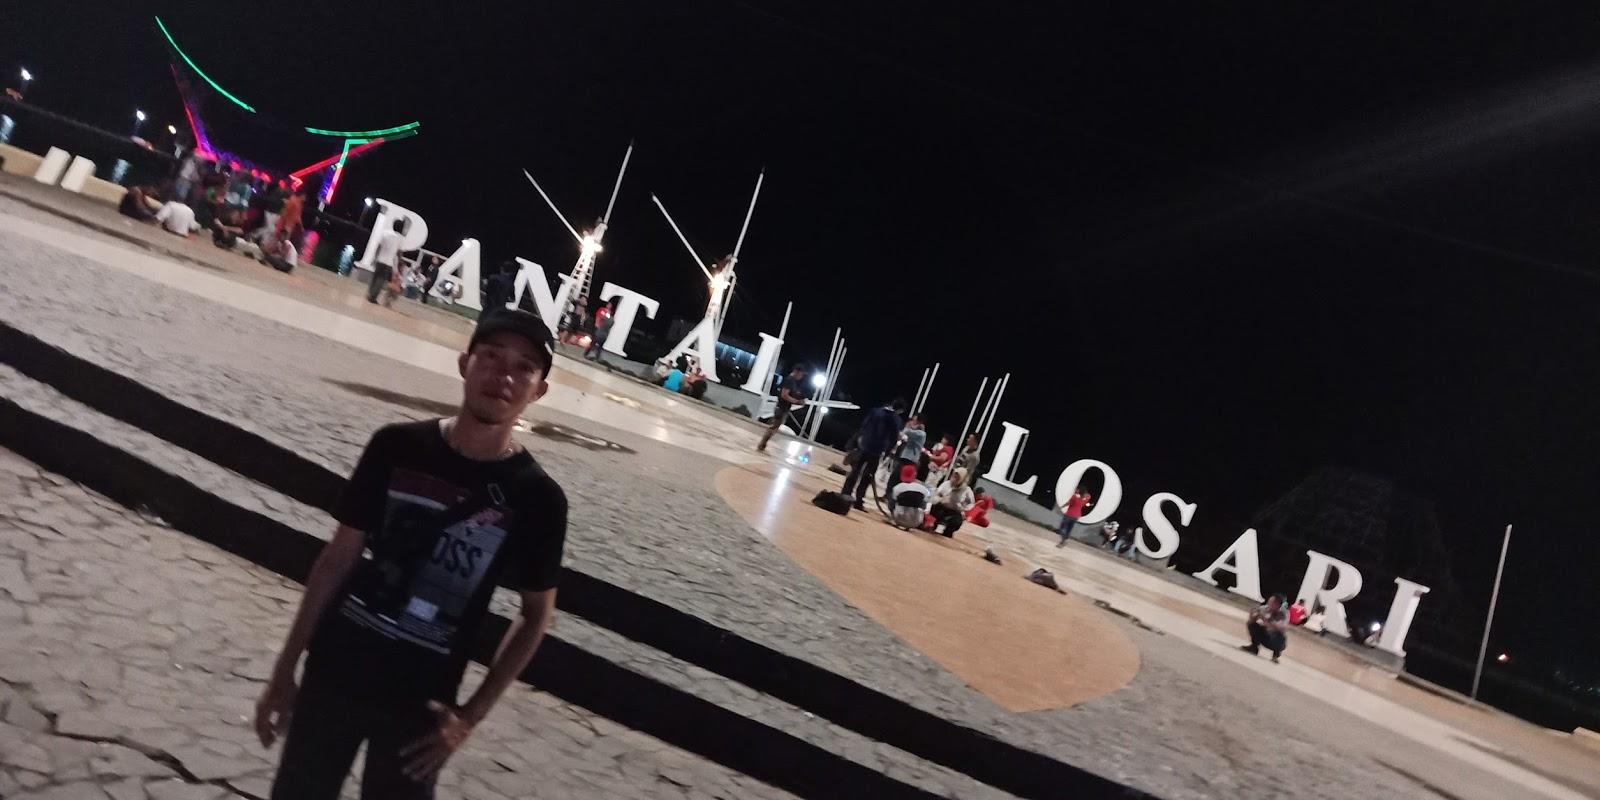 Potret Perjalanan Wisata Tulisanku Pantai Losari Kota Jalan Ki Jangan